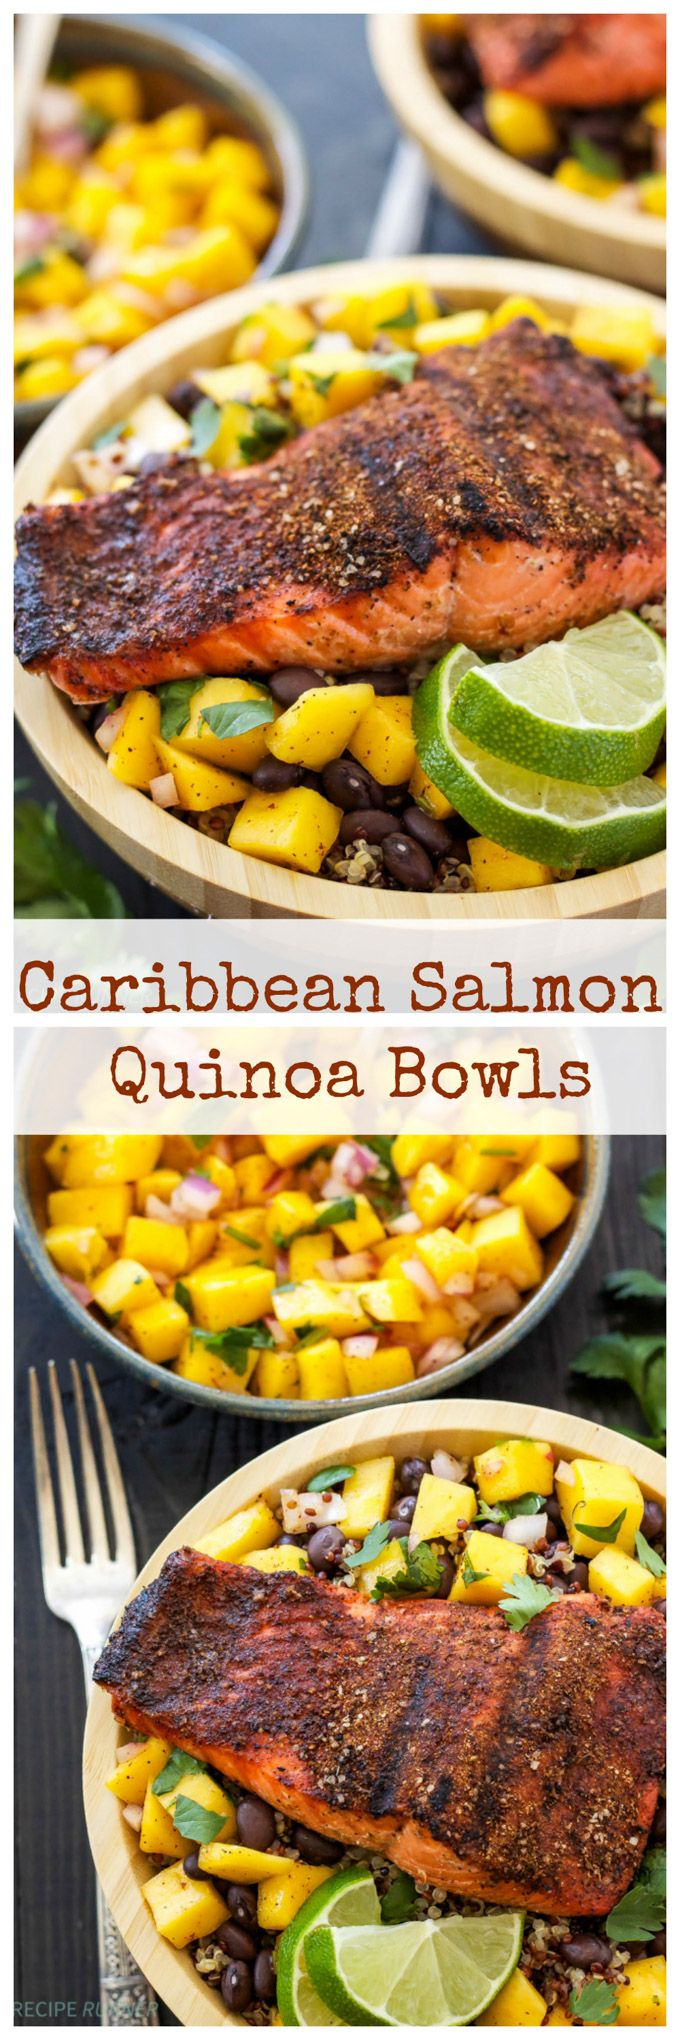 Caribbean Salmon Quinoa Bowls   Caribbean spice rubbed salmon on top of quinoa, black beans, and fresh mango salsa!